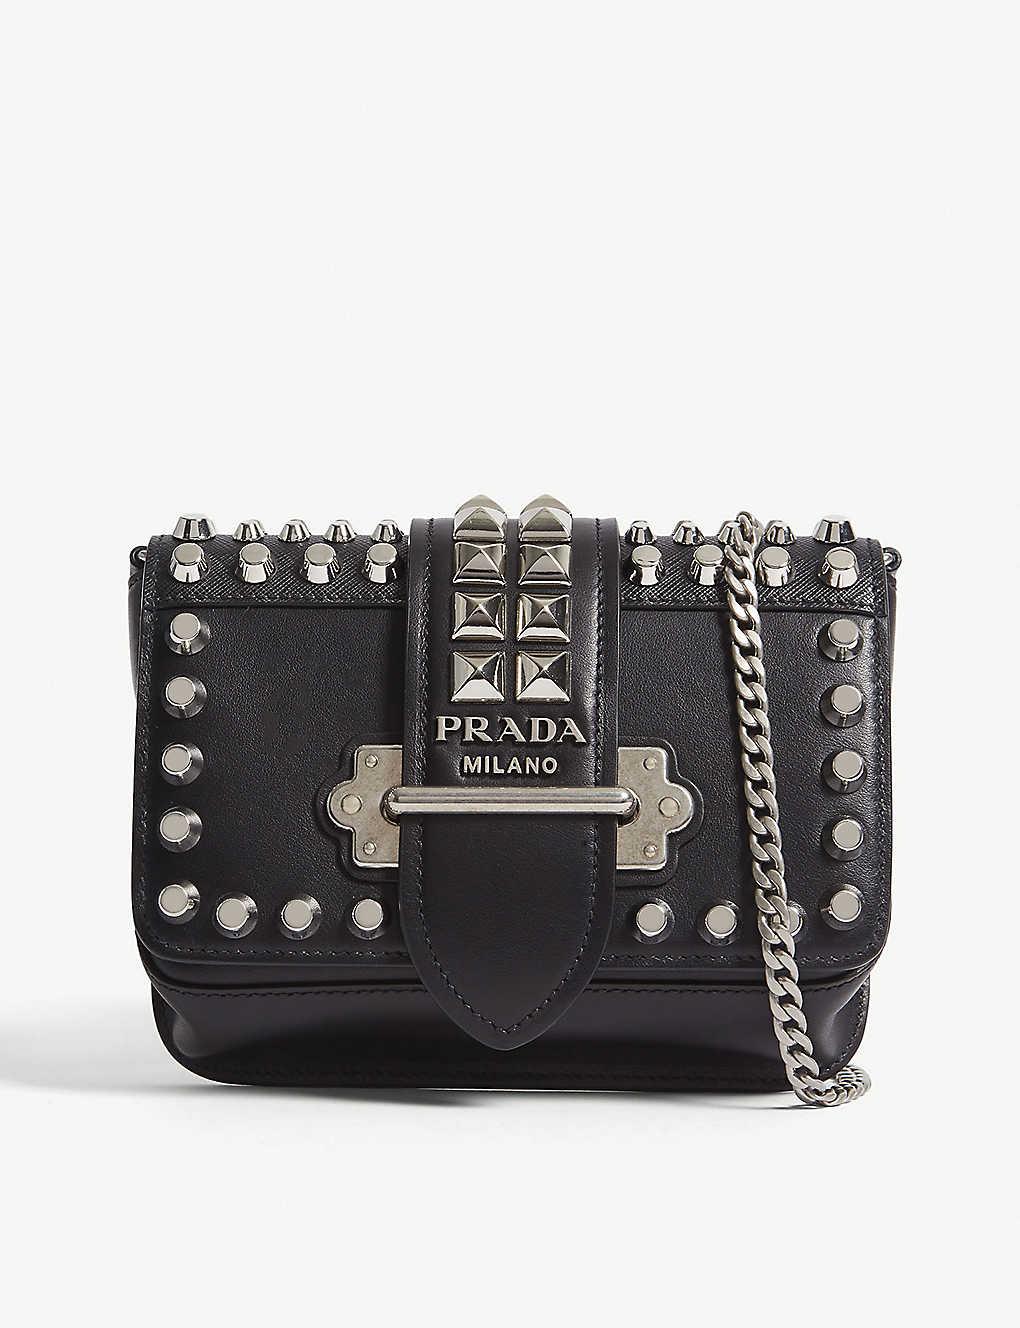 PRADA - Cahier leather belt bag  90575fe8ce525